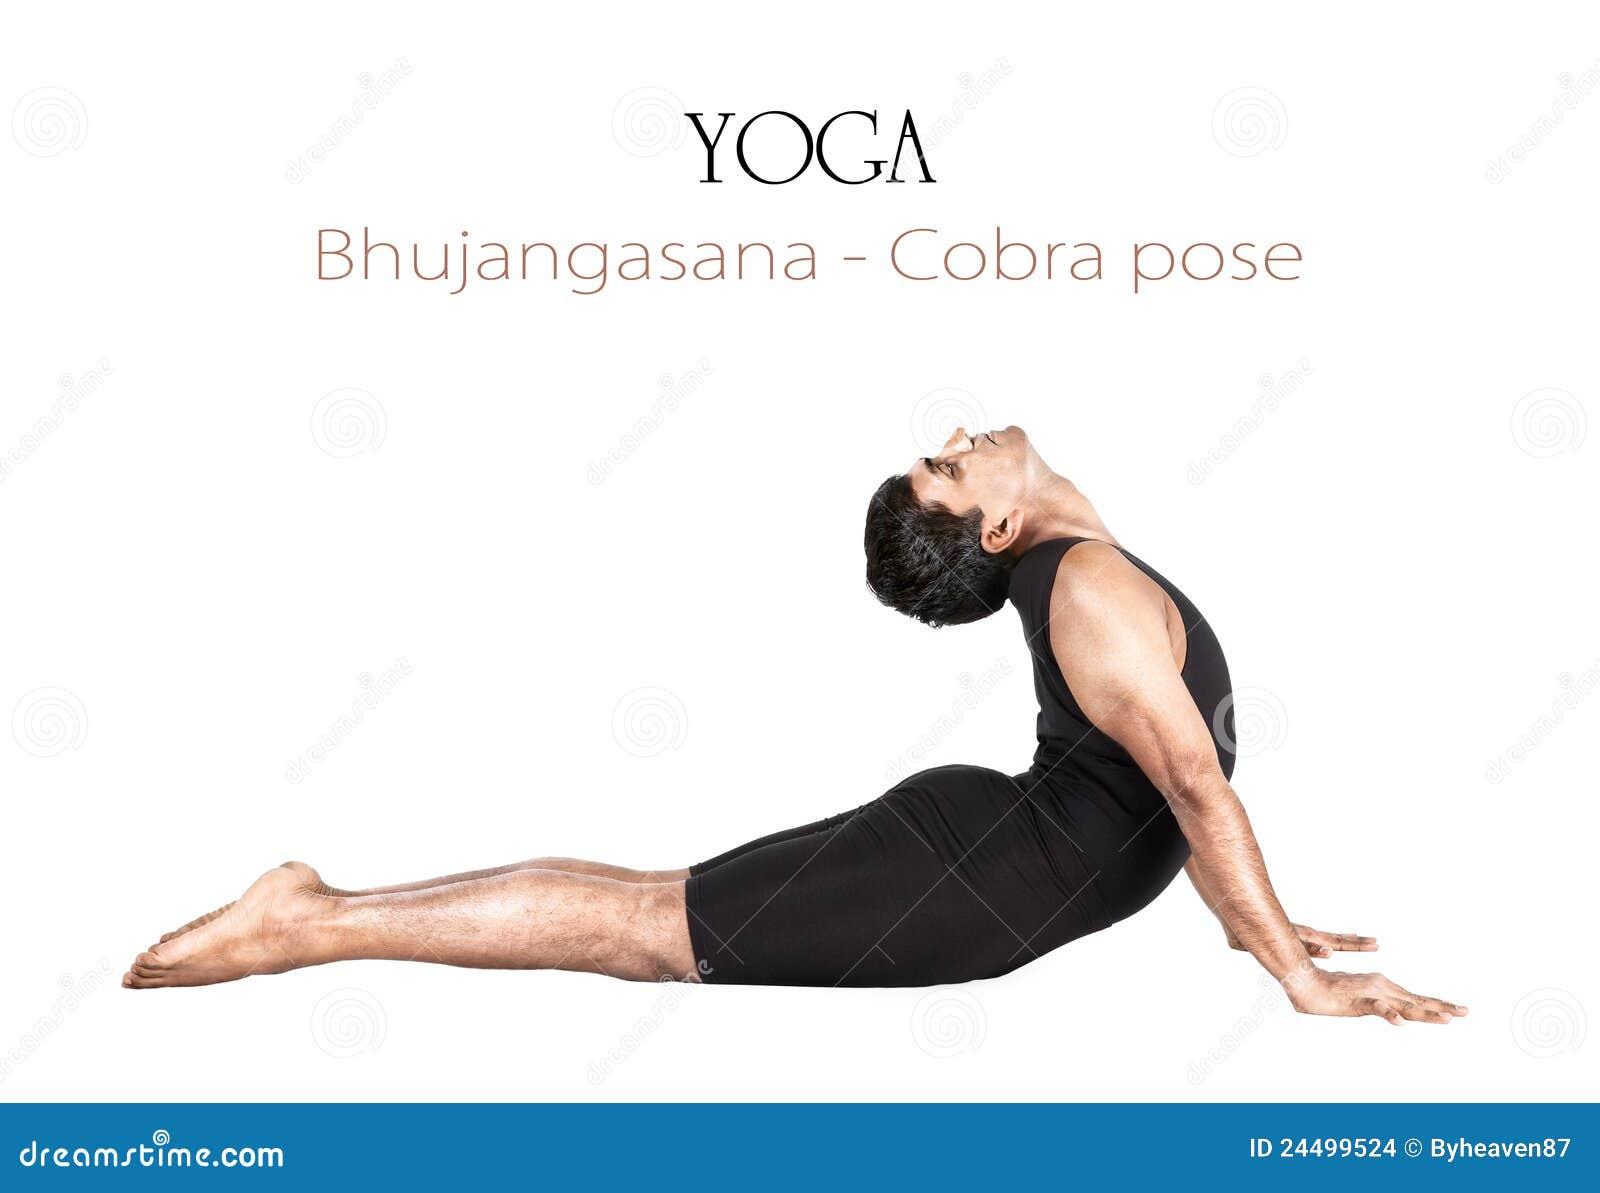 Yoga Meditation Pose Yoga Bhujangasana Cobr...